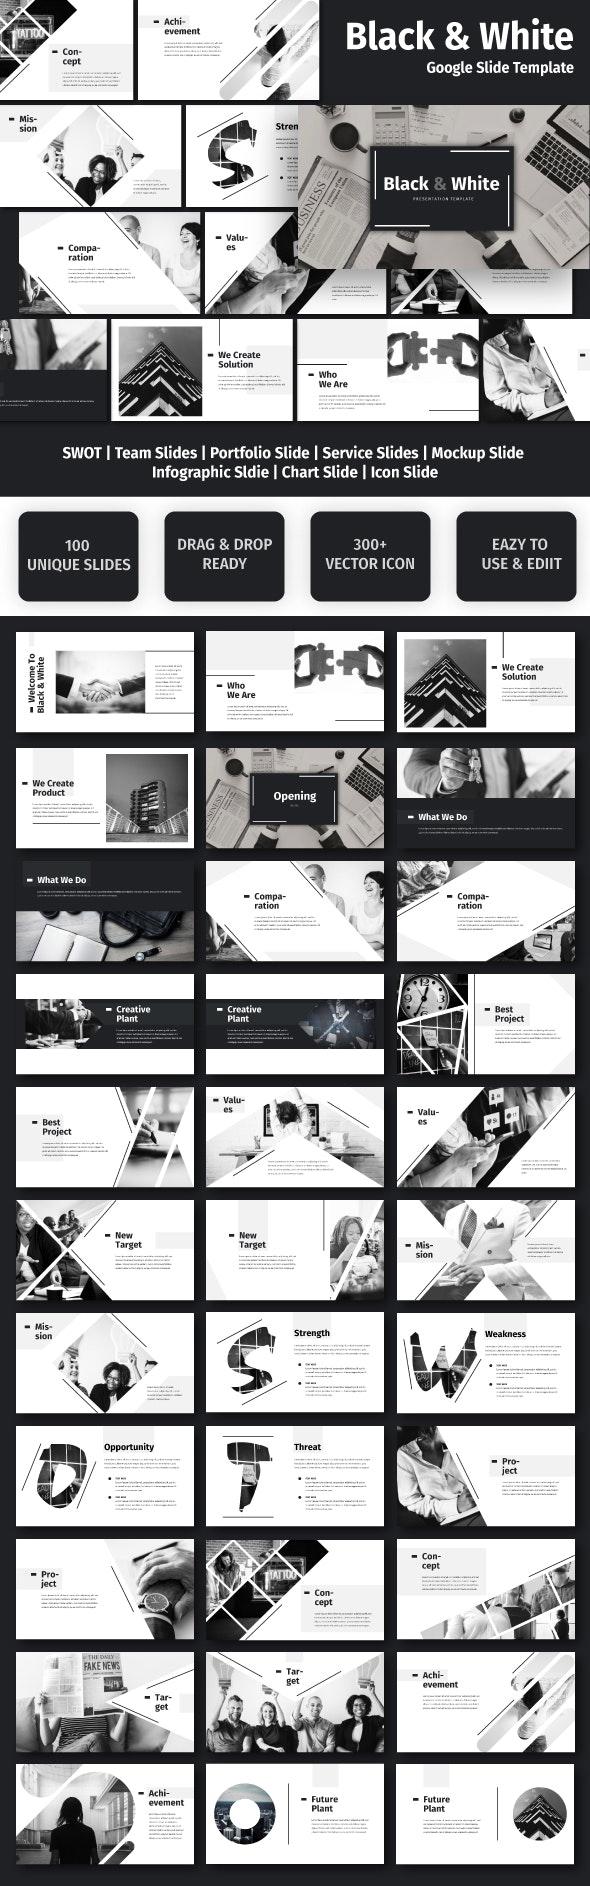 Black & White - Business Google Slide Template - Google Slides Presentation Templates